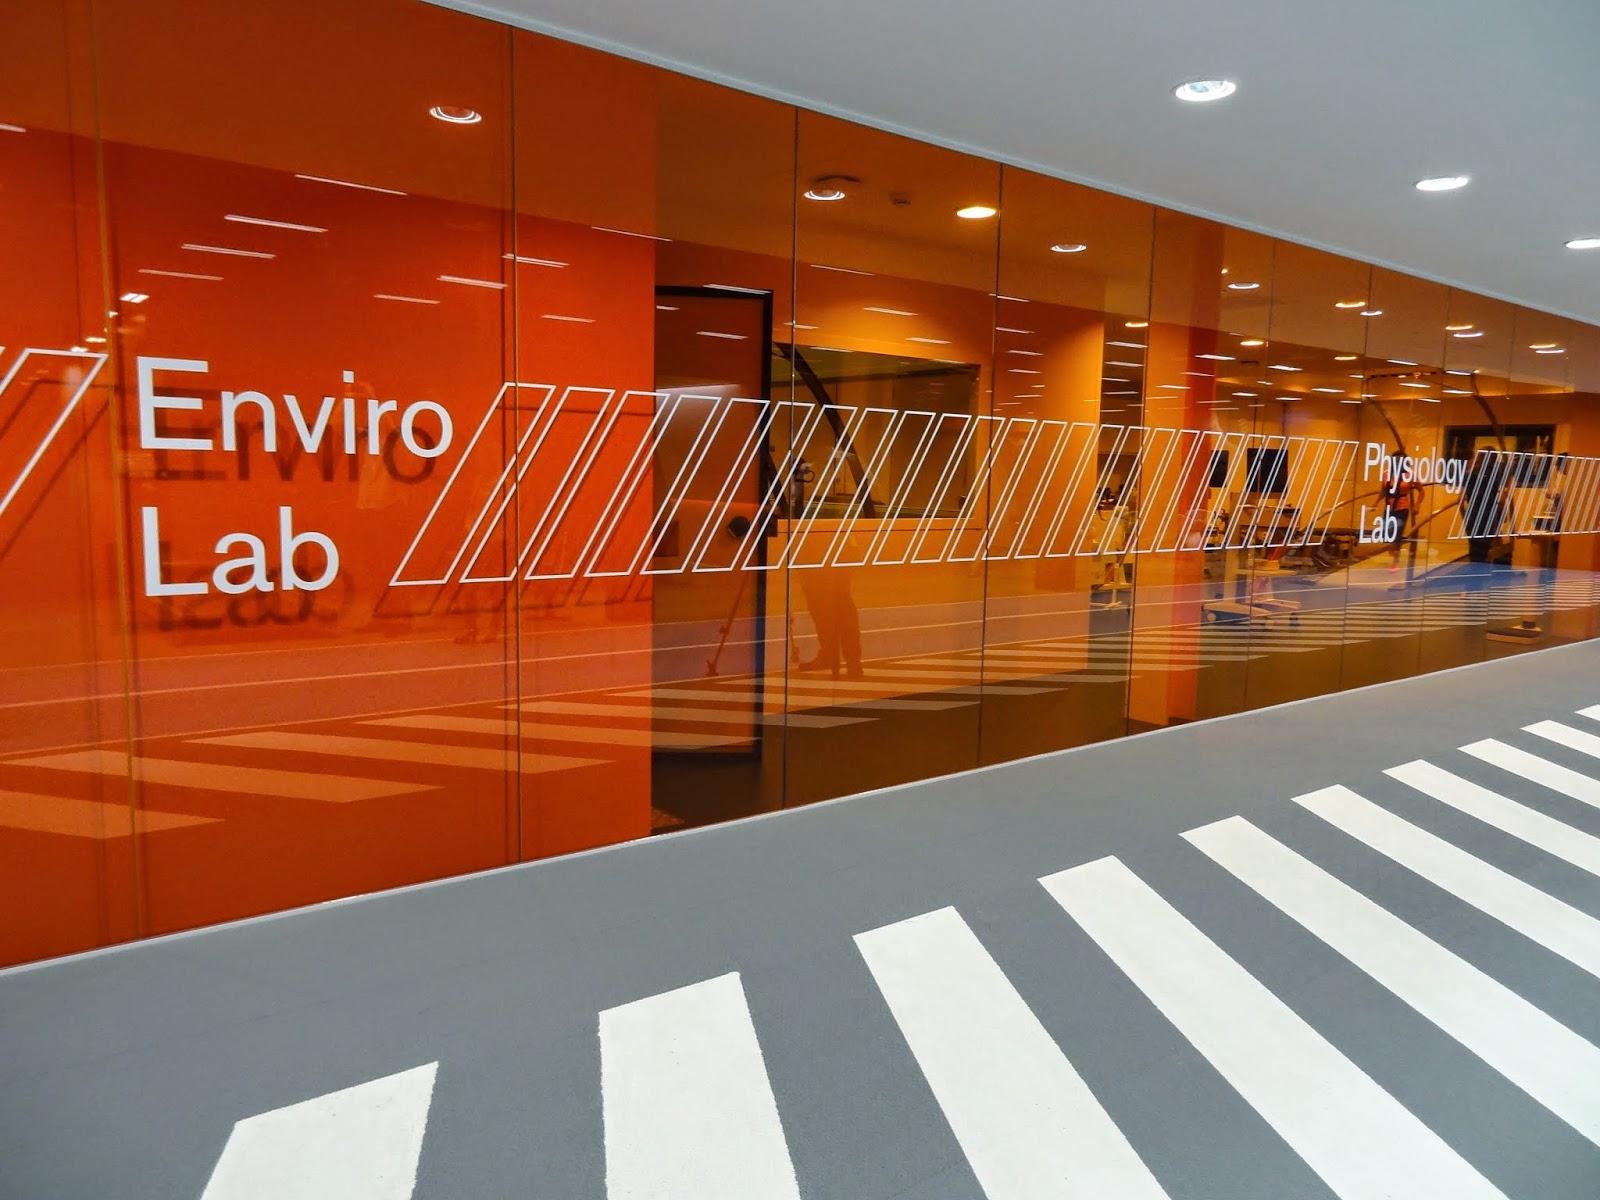 GSK_HPL_Enviro_Physiology_Lab.JPG